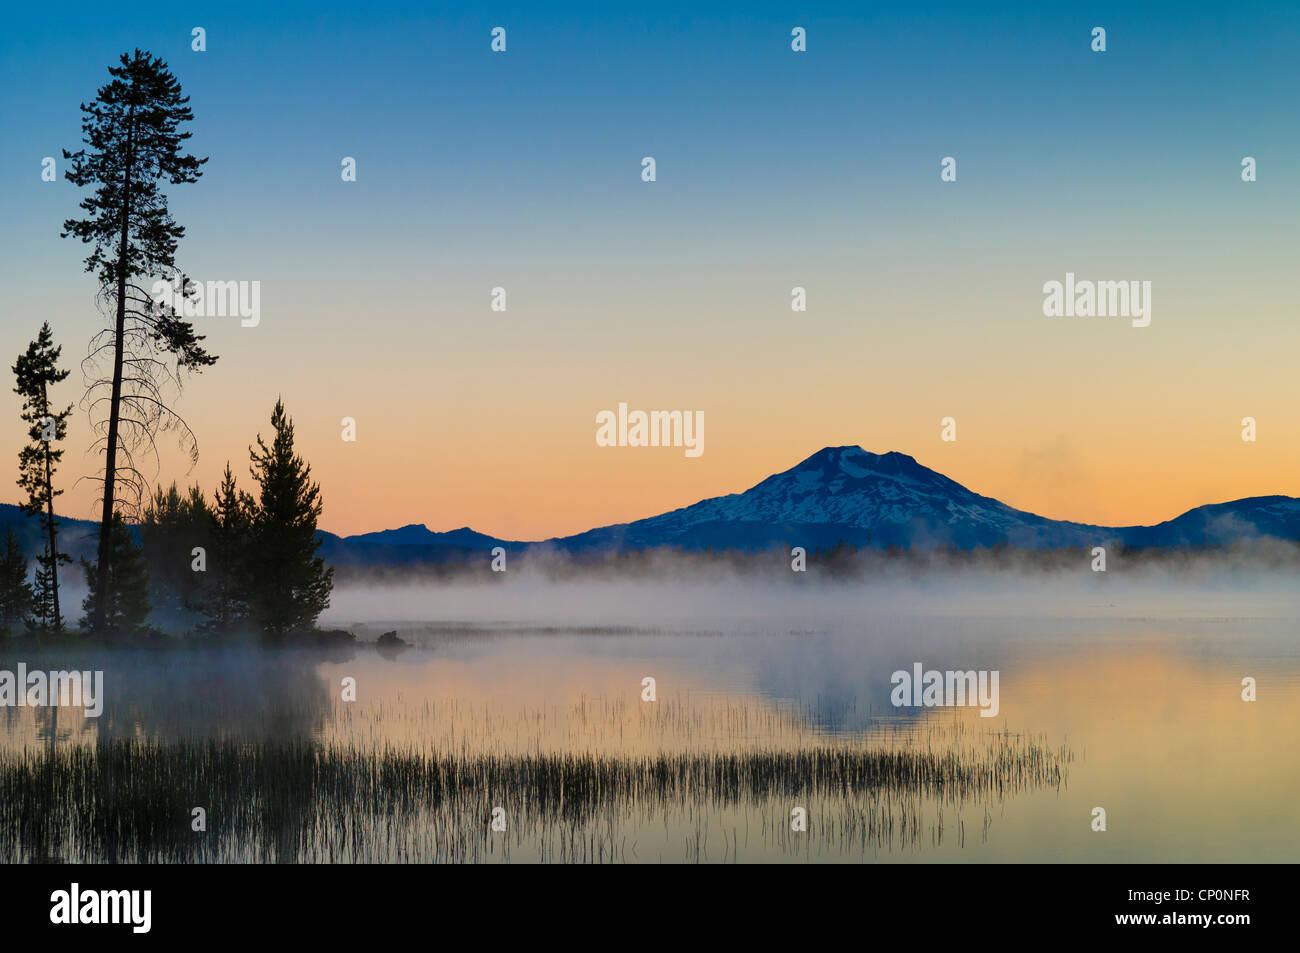 Crane Prairie Reservoir and Mount Bachelor at dawn, Deschutes National Forest, central Oregon. - Stock Image